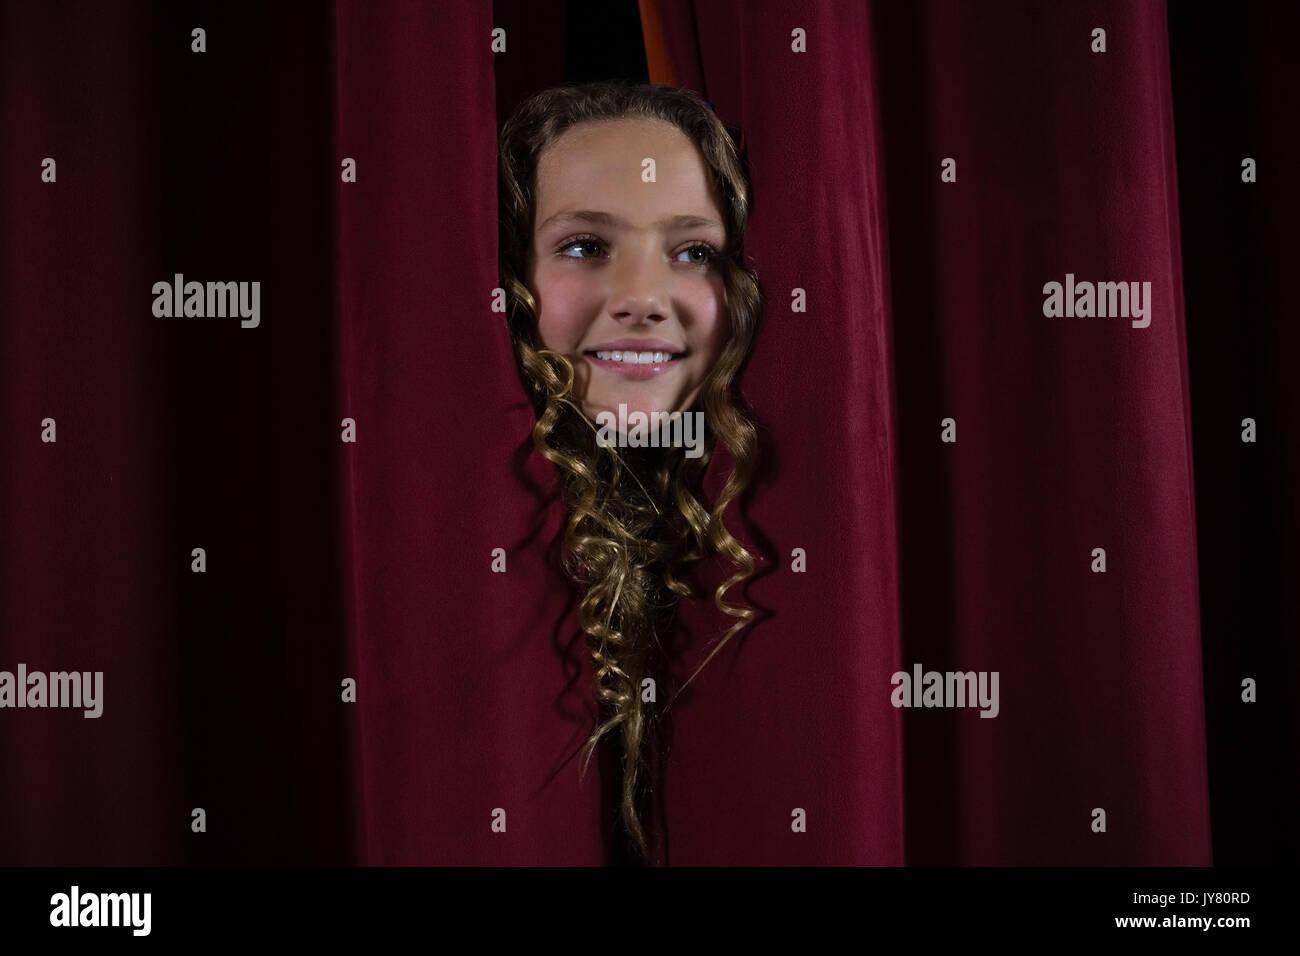 Smiling female artist peeking through the red curtain - Stock Image